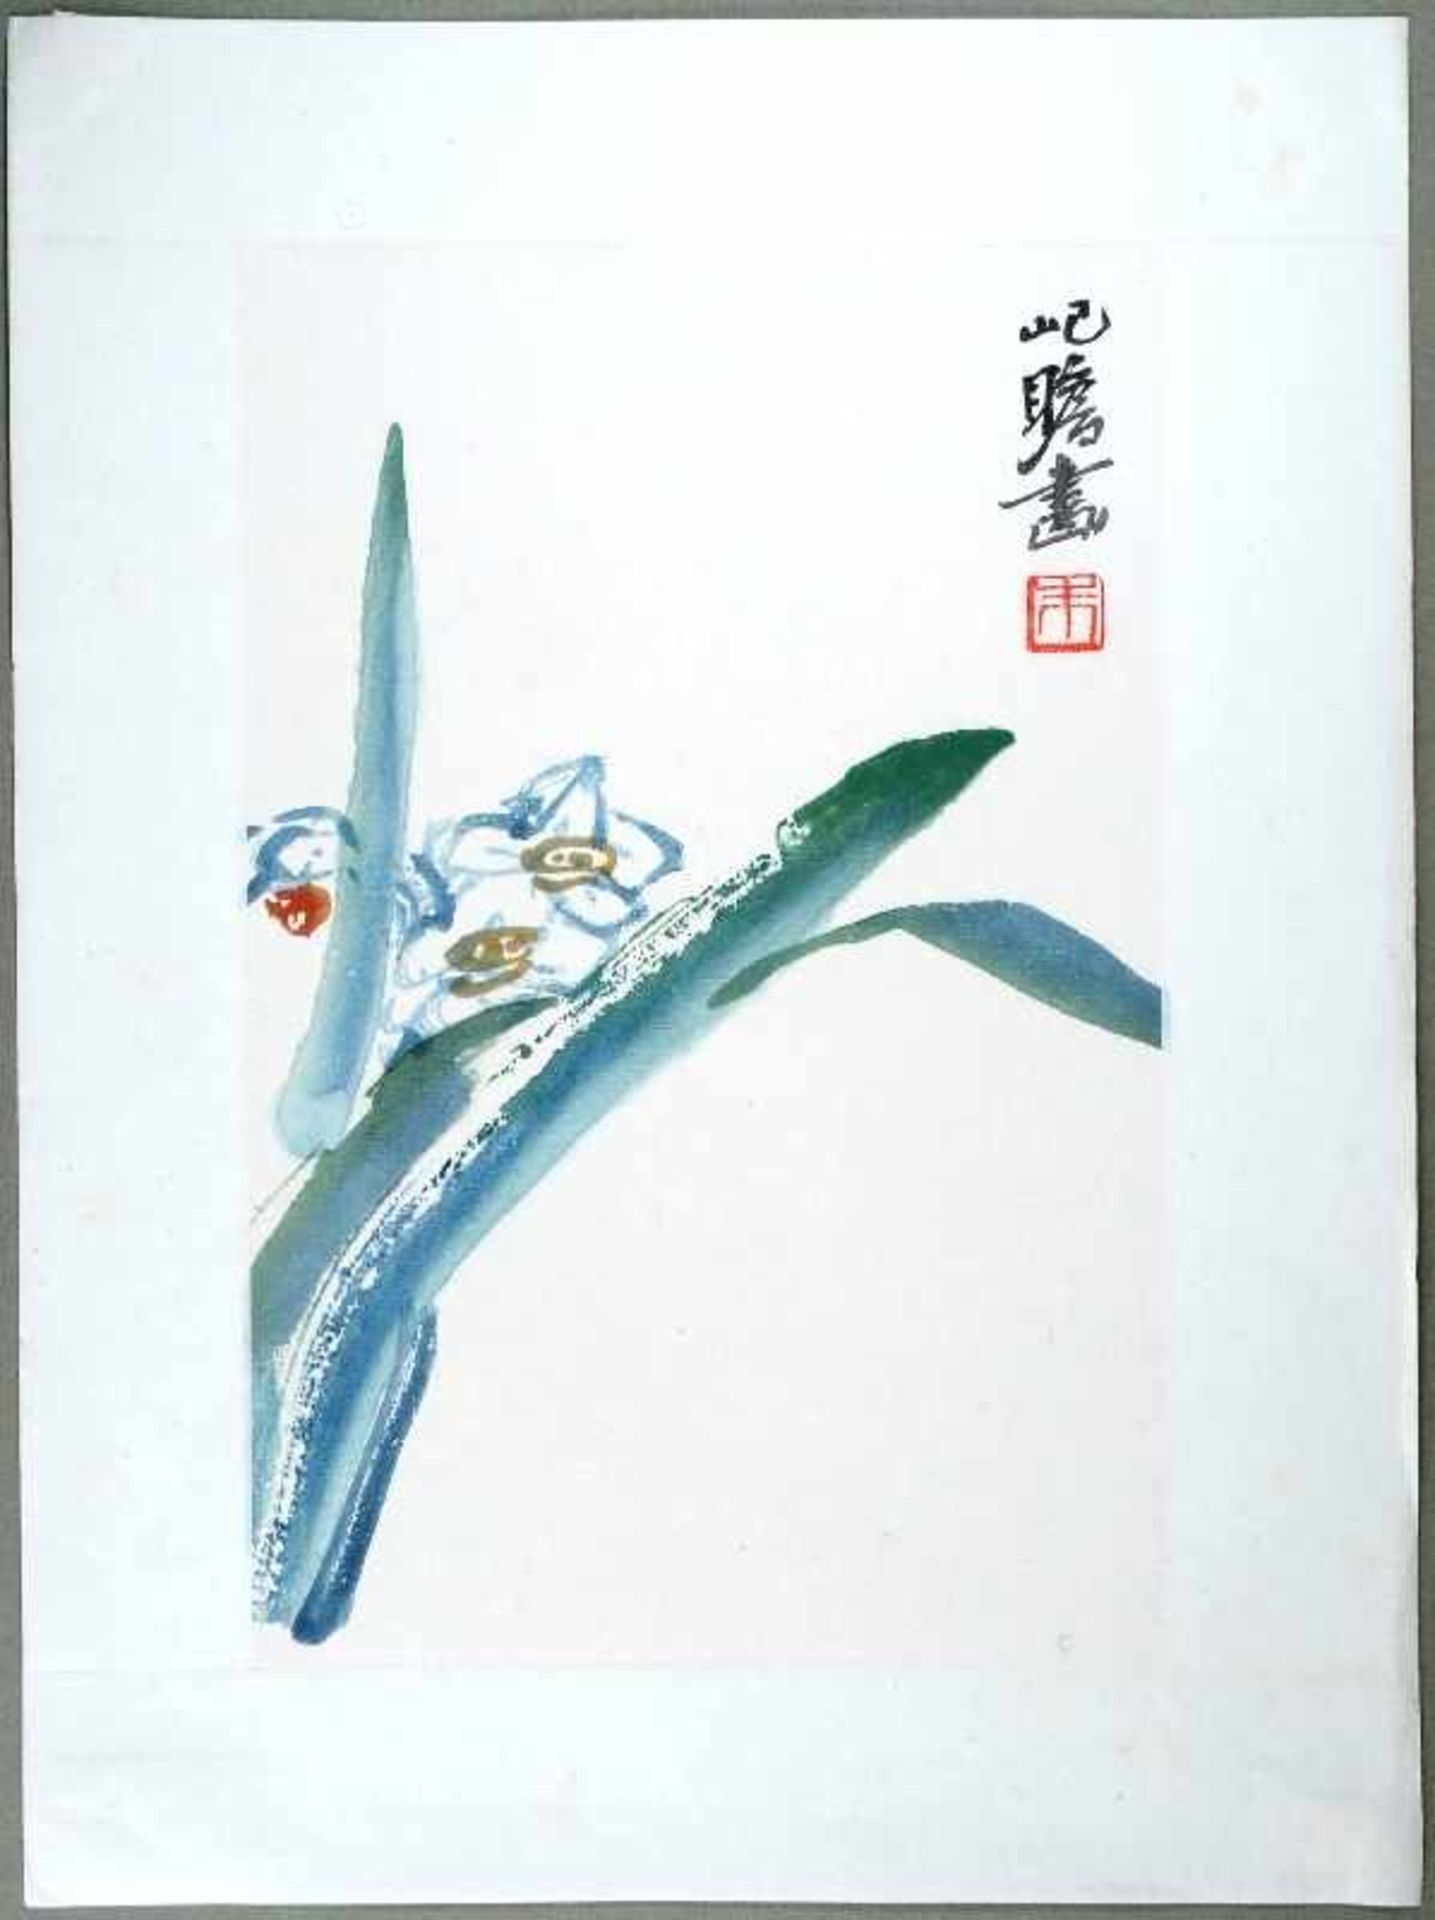 Zhu Jizhang (20. Jh.) Aquarellfarben-Holzschnitt. China, 20th cent. Darstellung einer Narzisse mit